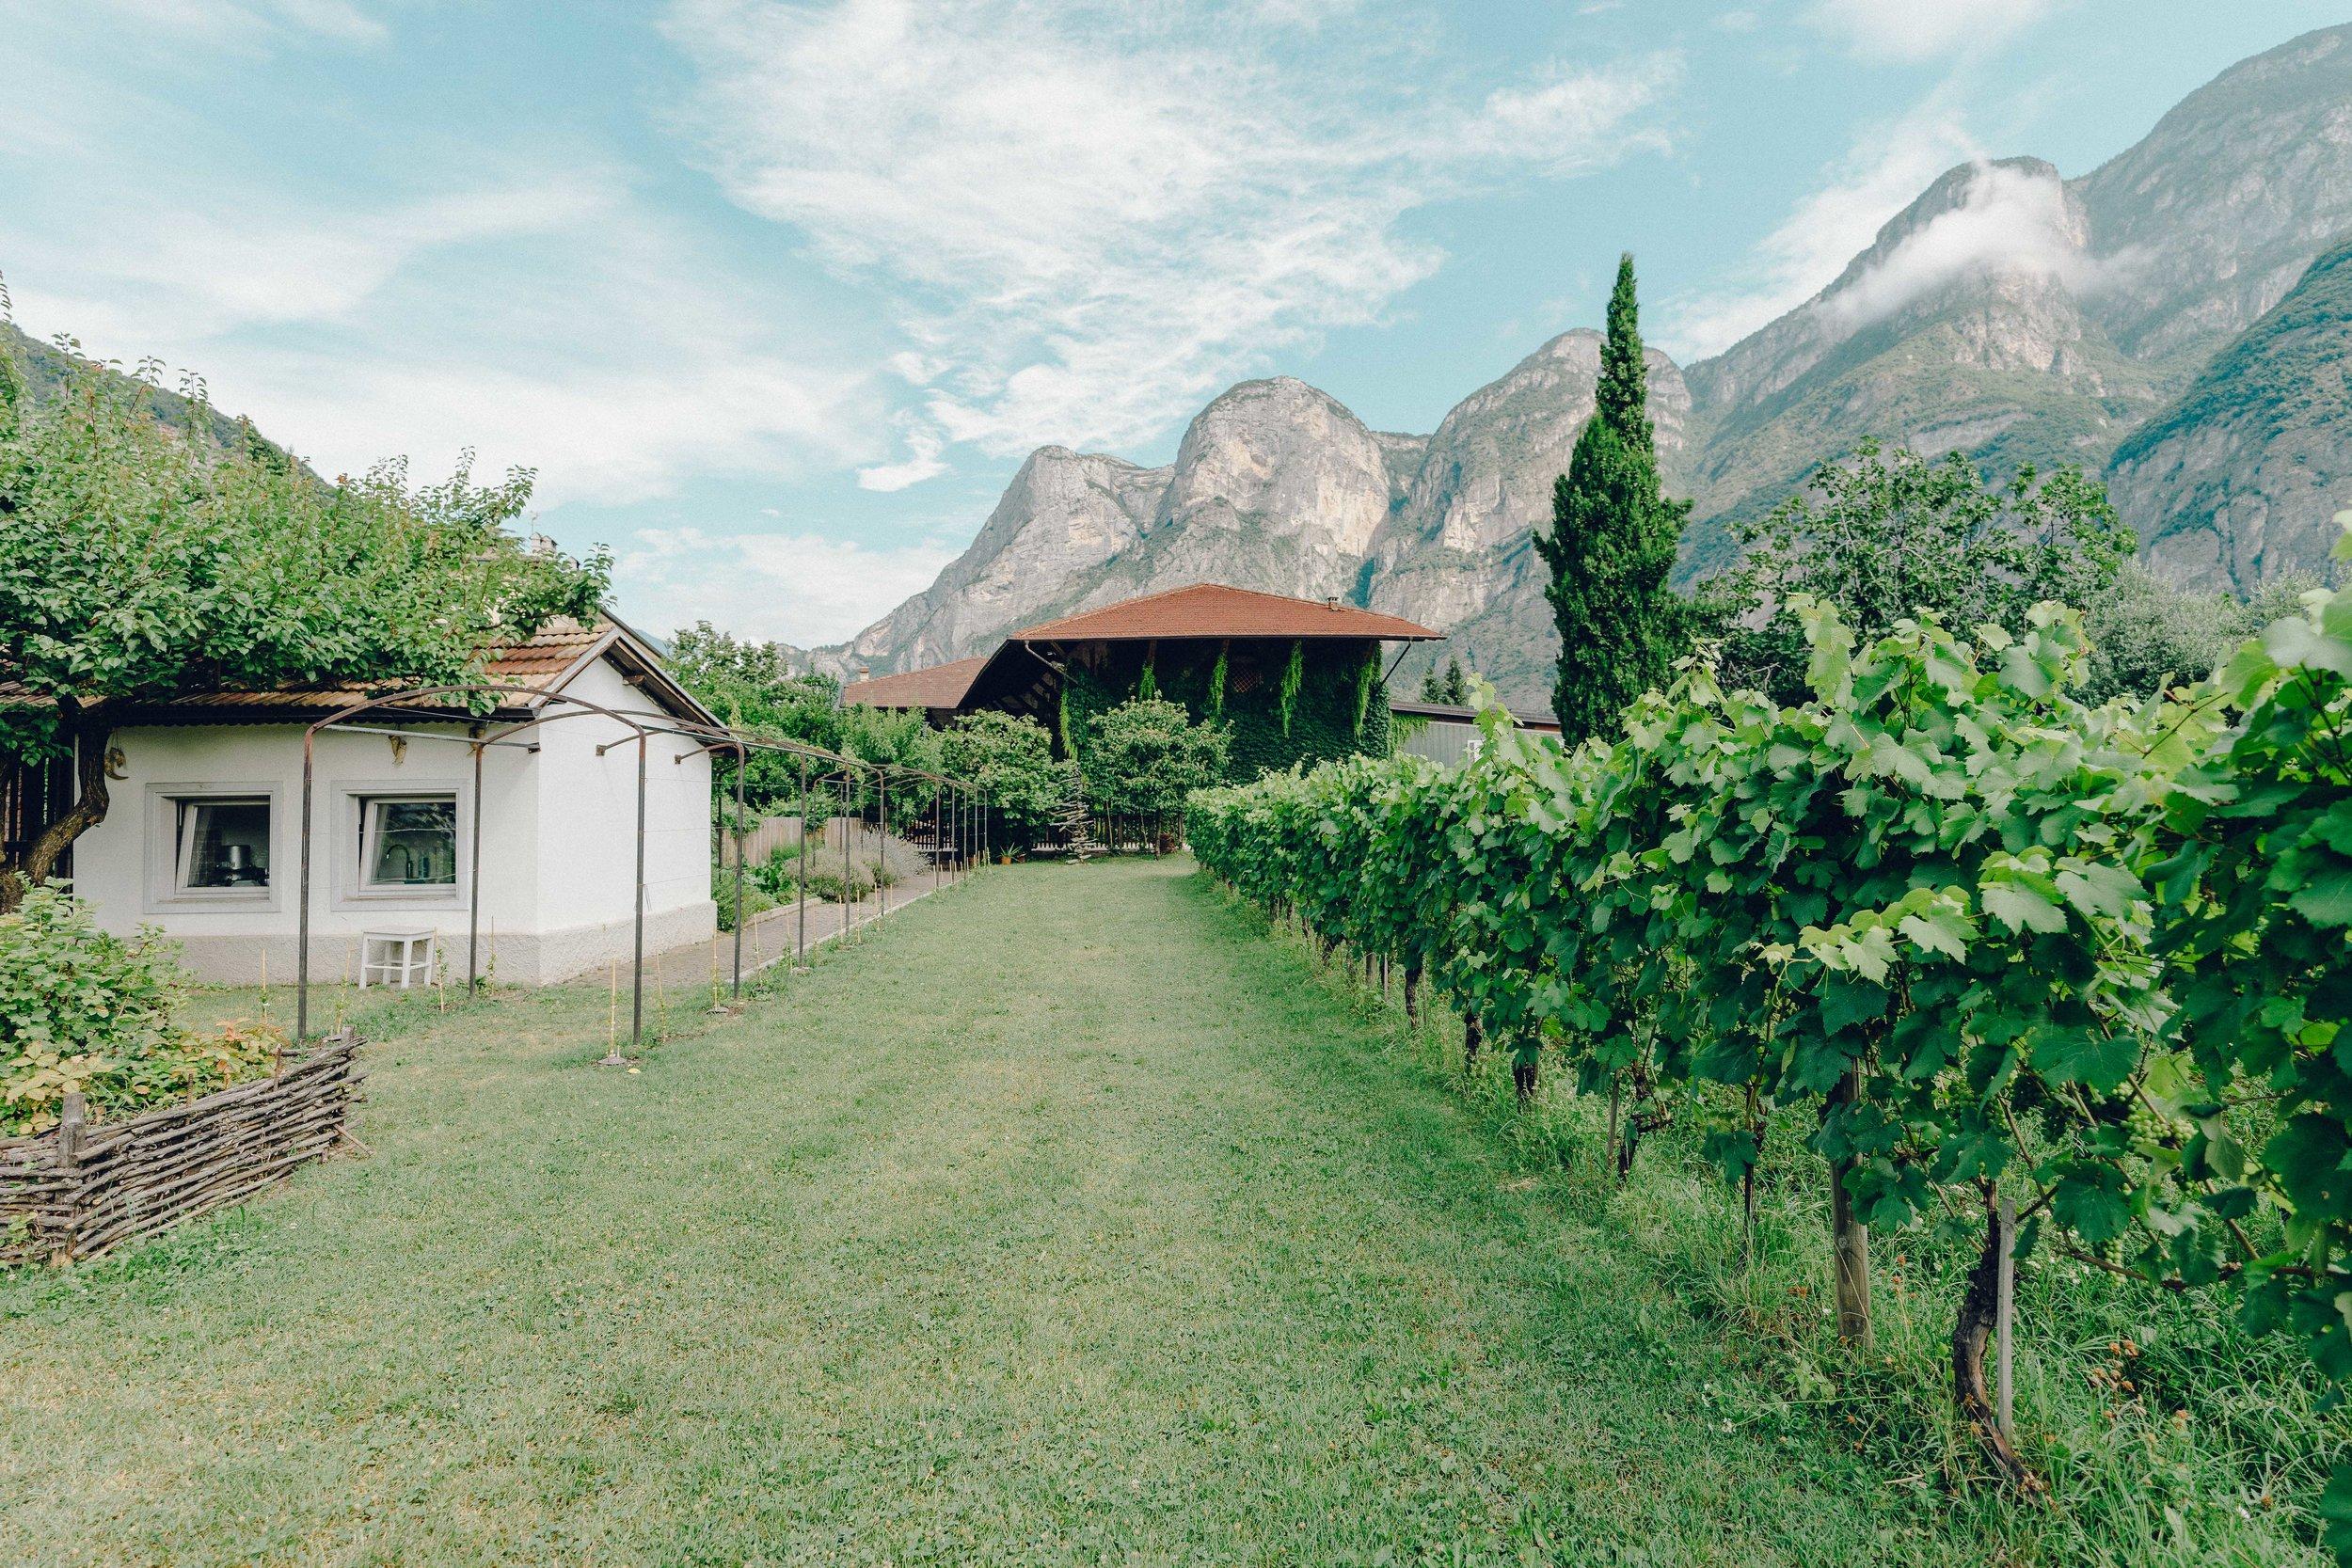 ASROSENVINGE_Roadtrip_Italy_Dolomites_Vineyard_Foradori-06574.jpg